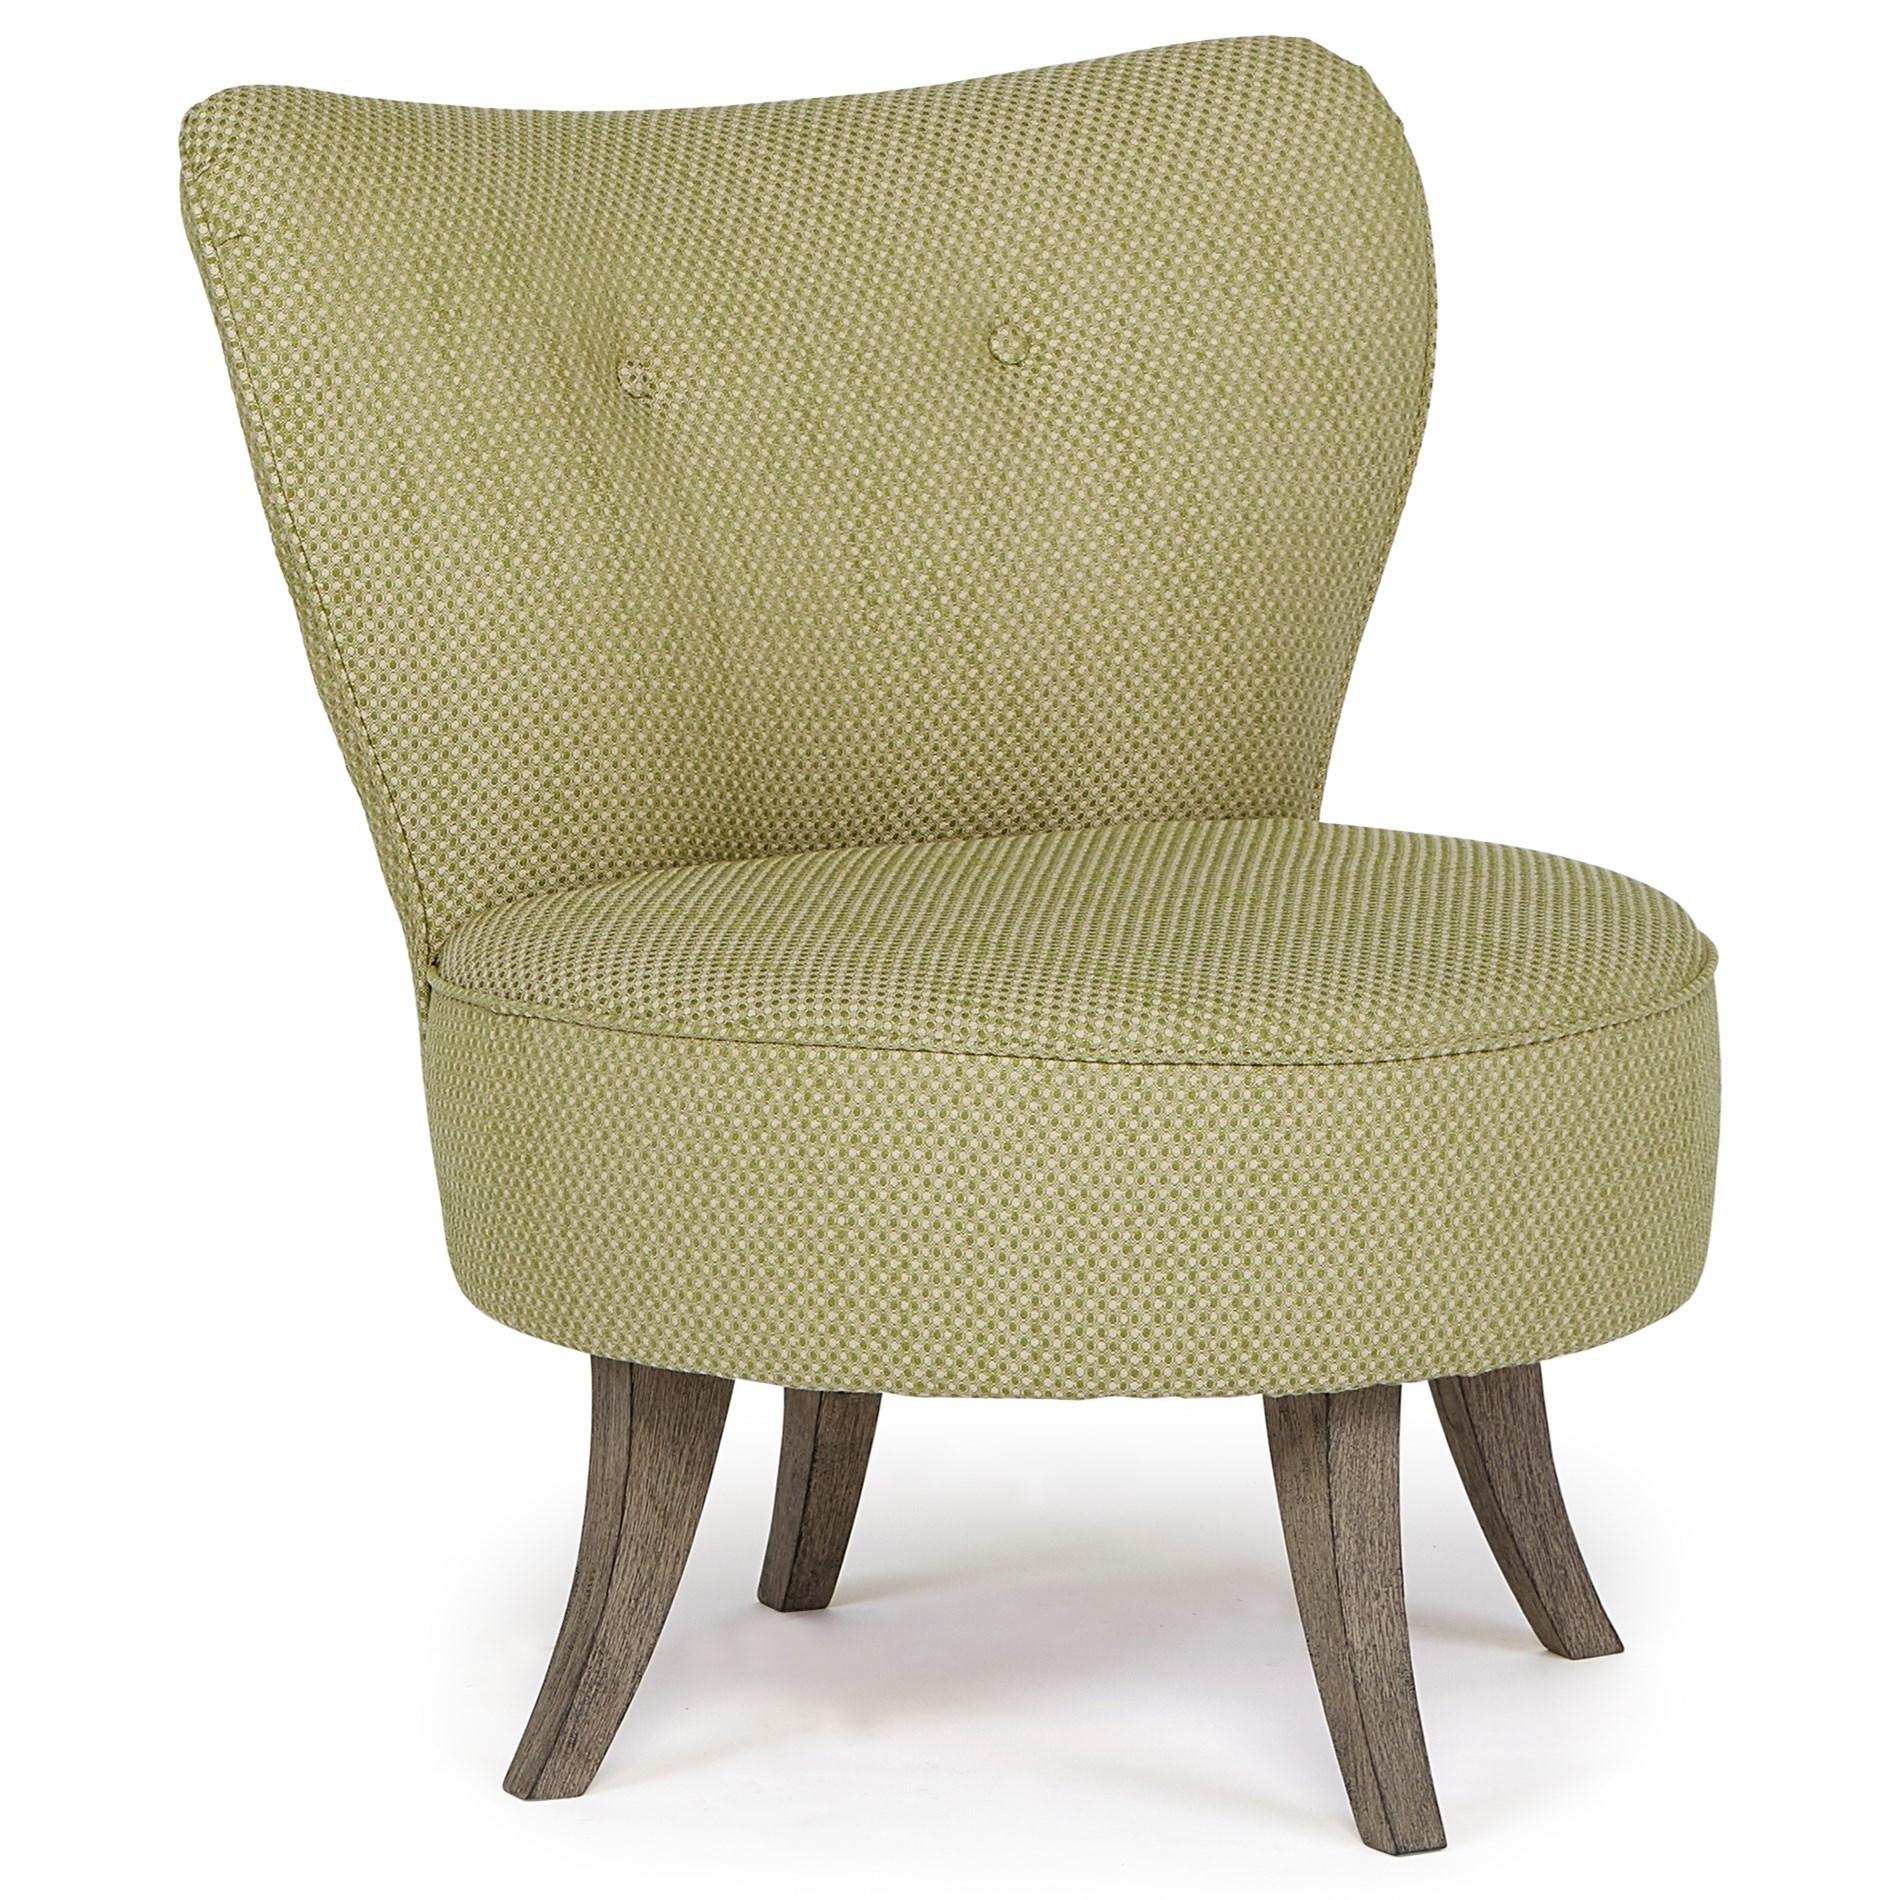 Best Home Furnishings Chairs   Swivel BarrelFlorence Swivel Chair